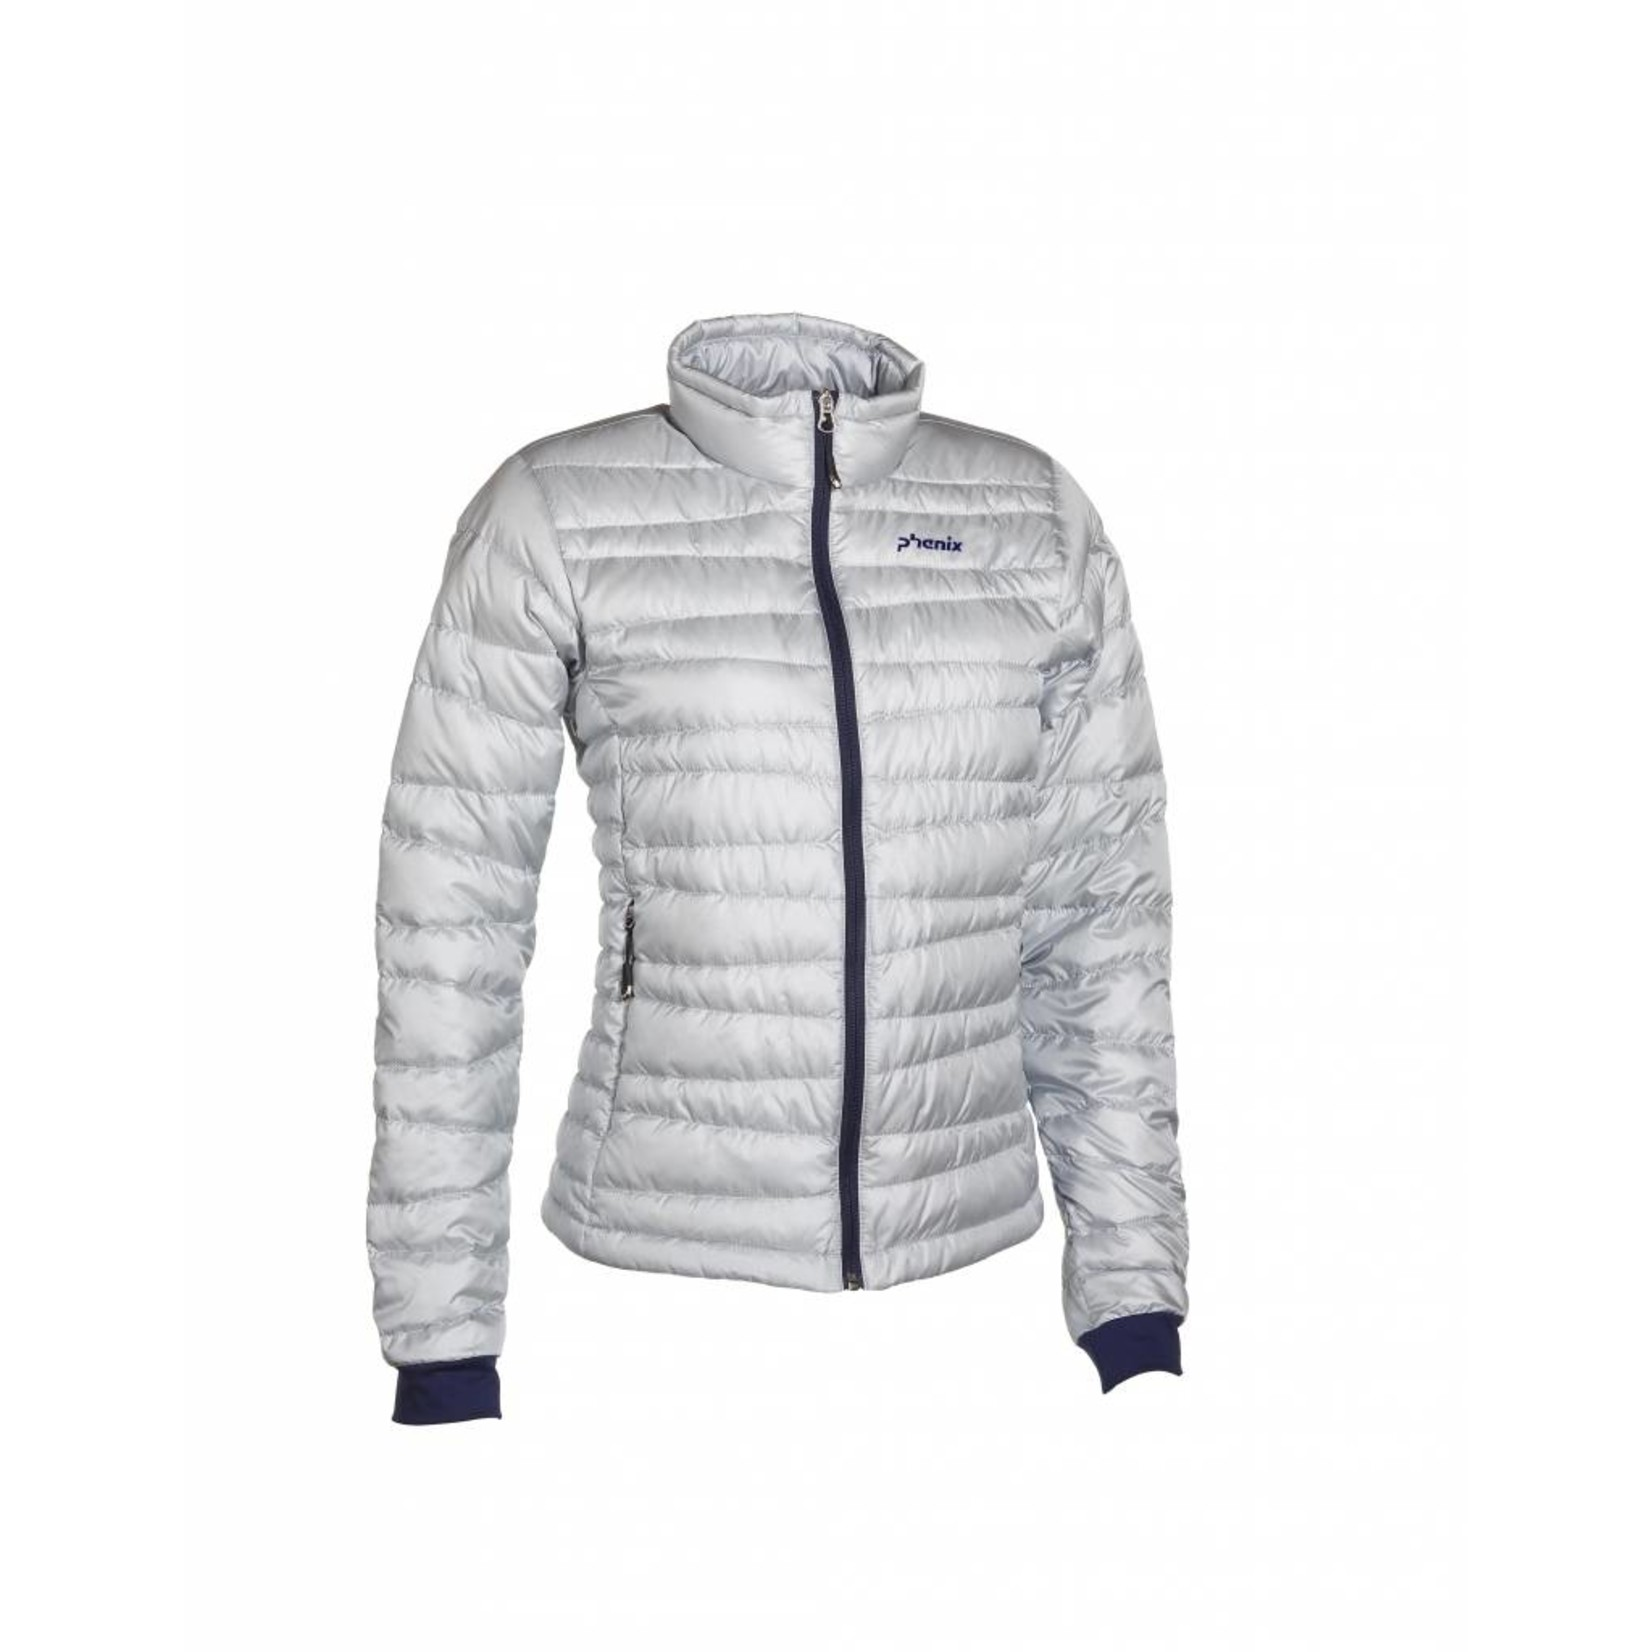 PHENIX Fluffy Insulation Jacket - SI